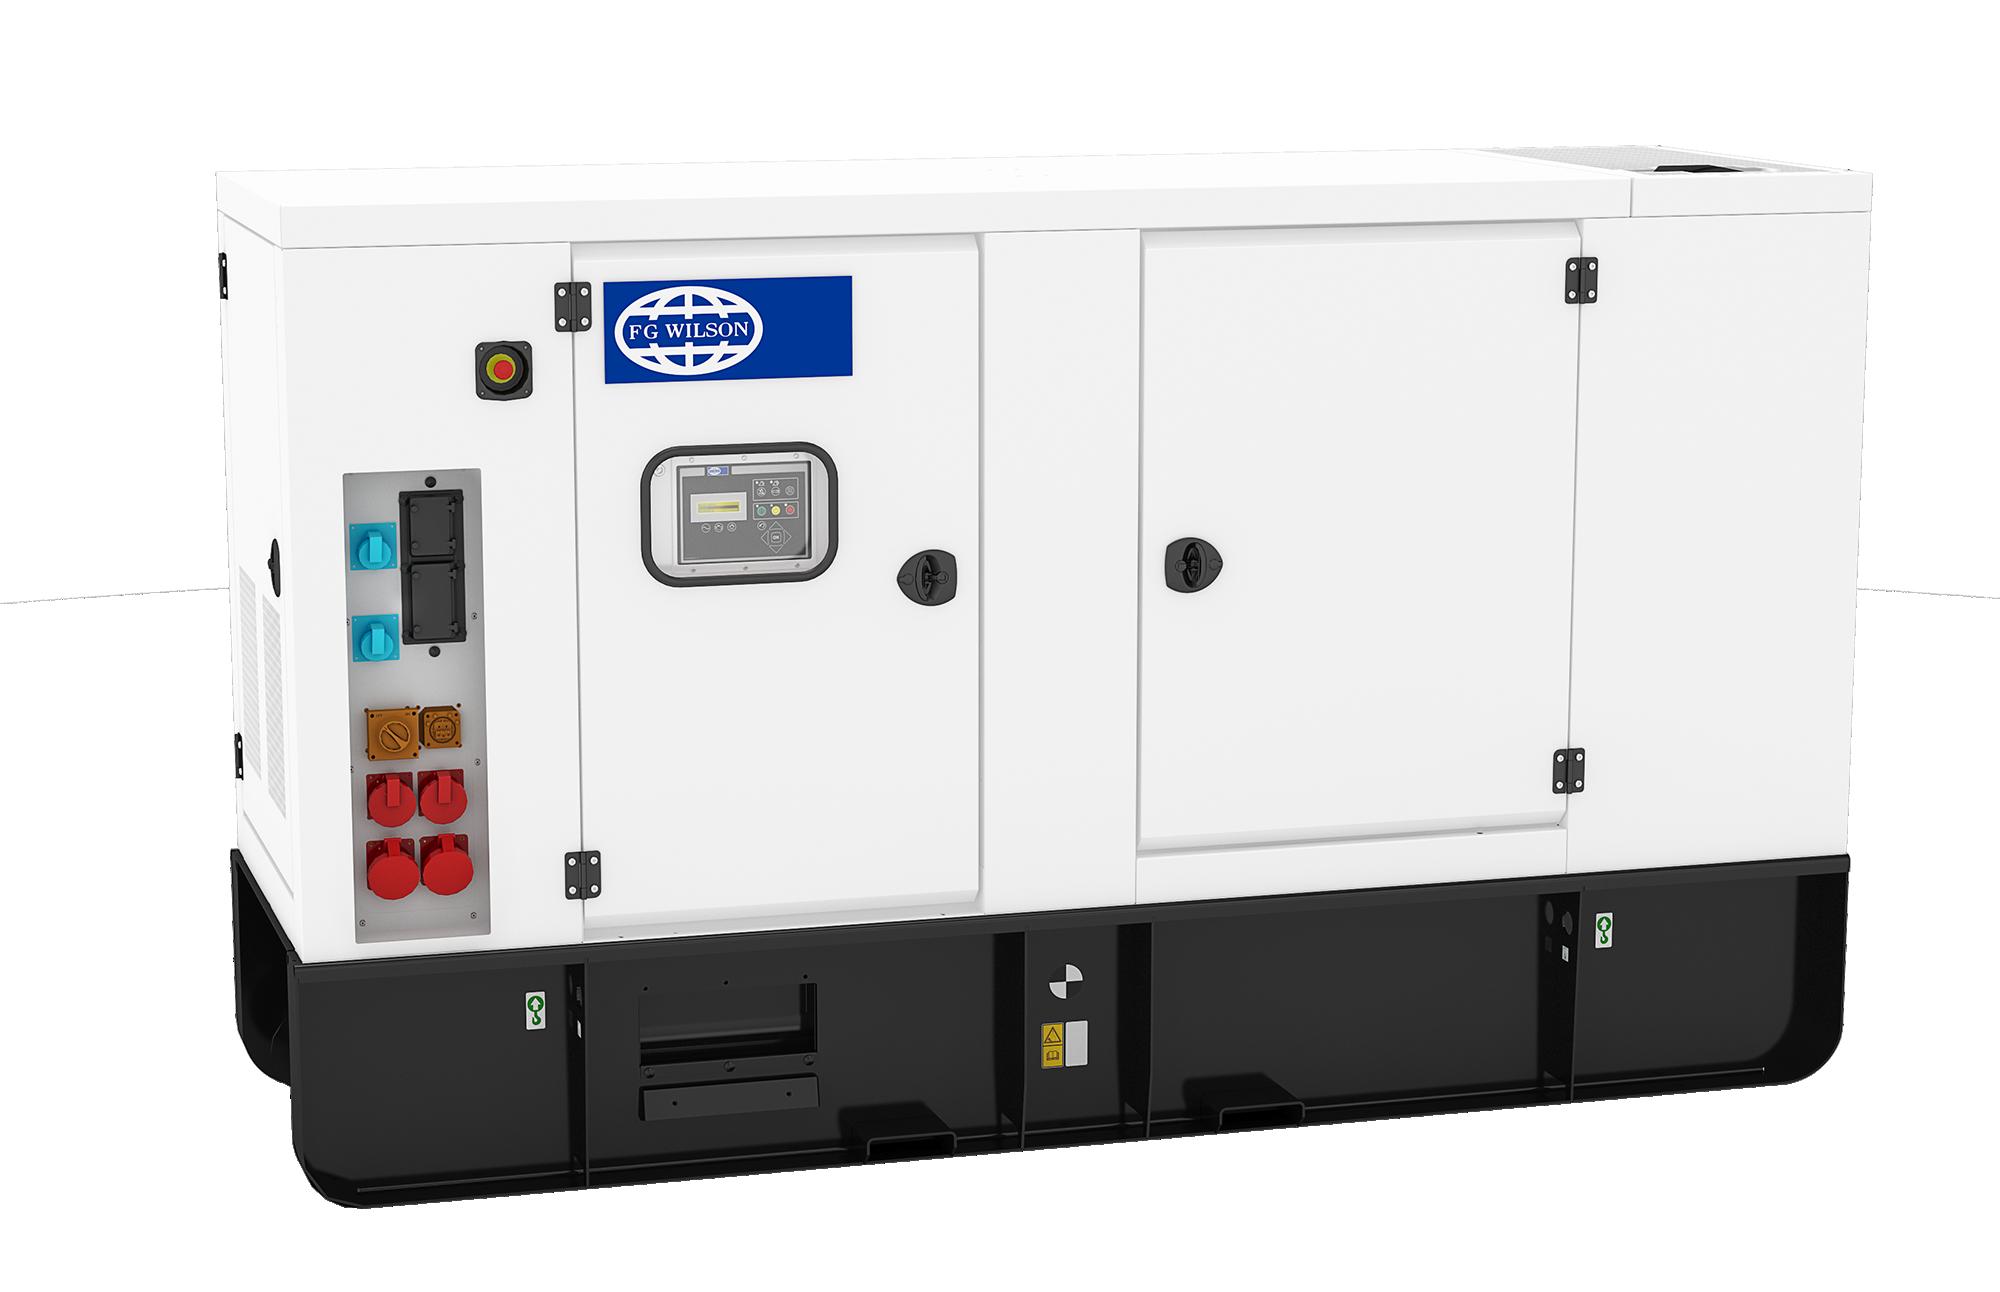 FG Wilson PRO Range Rental Generator Set